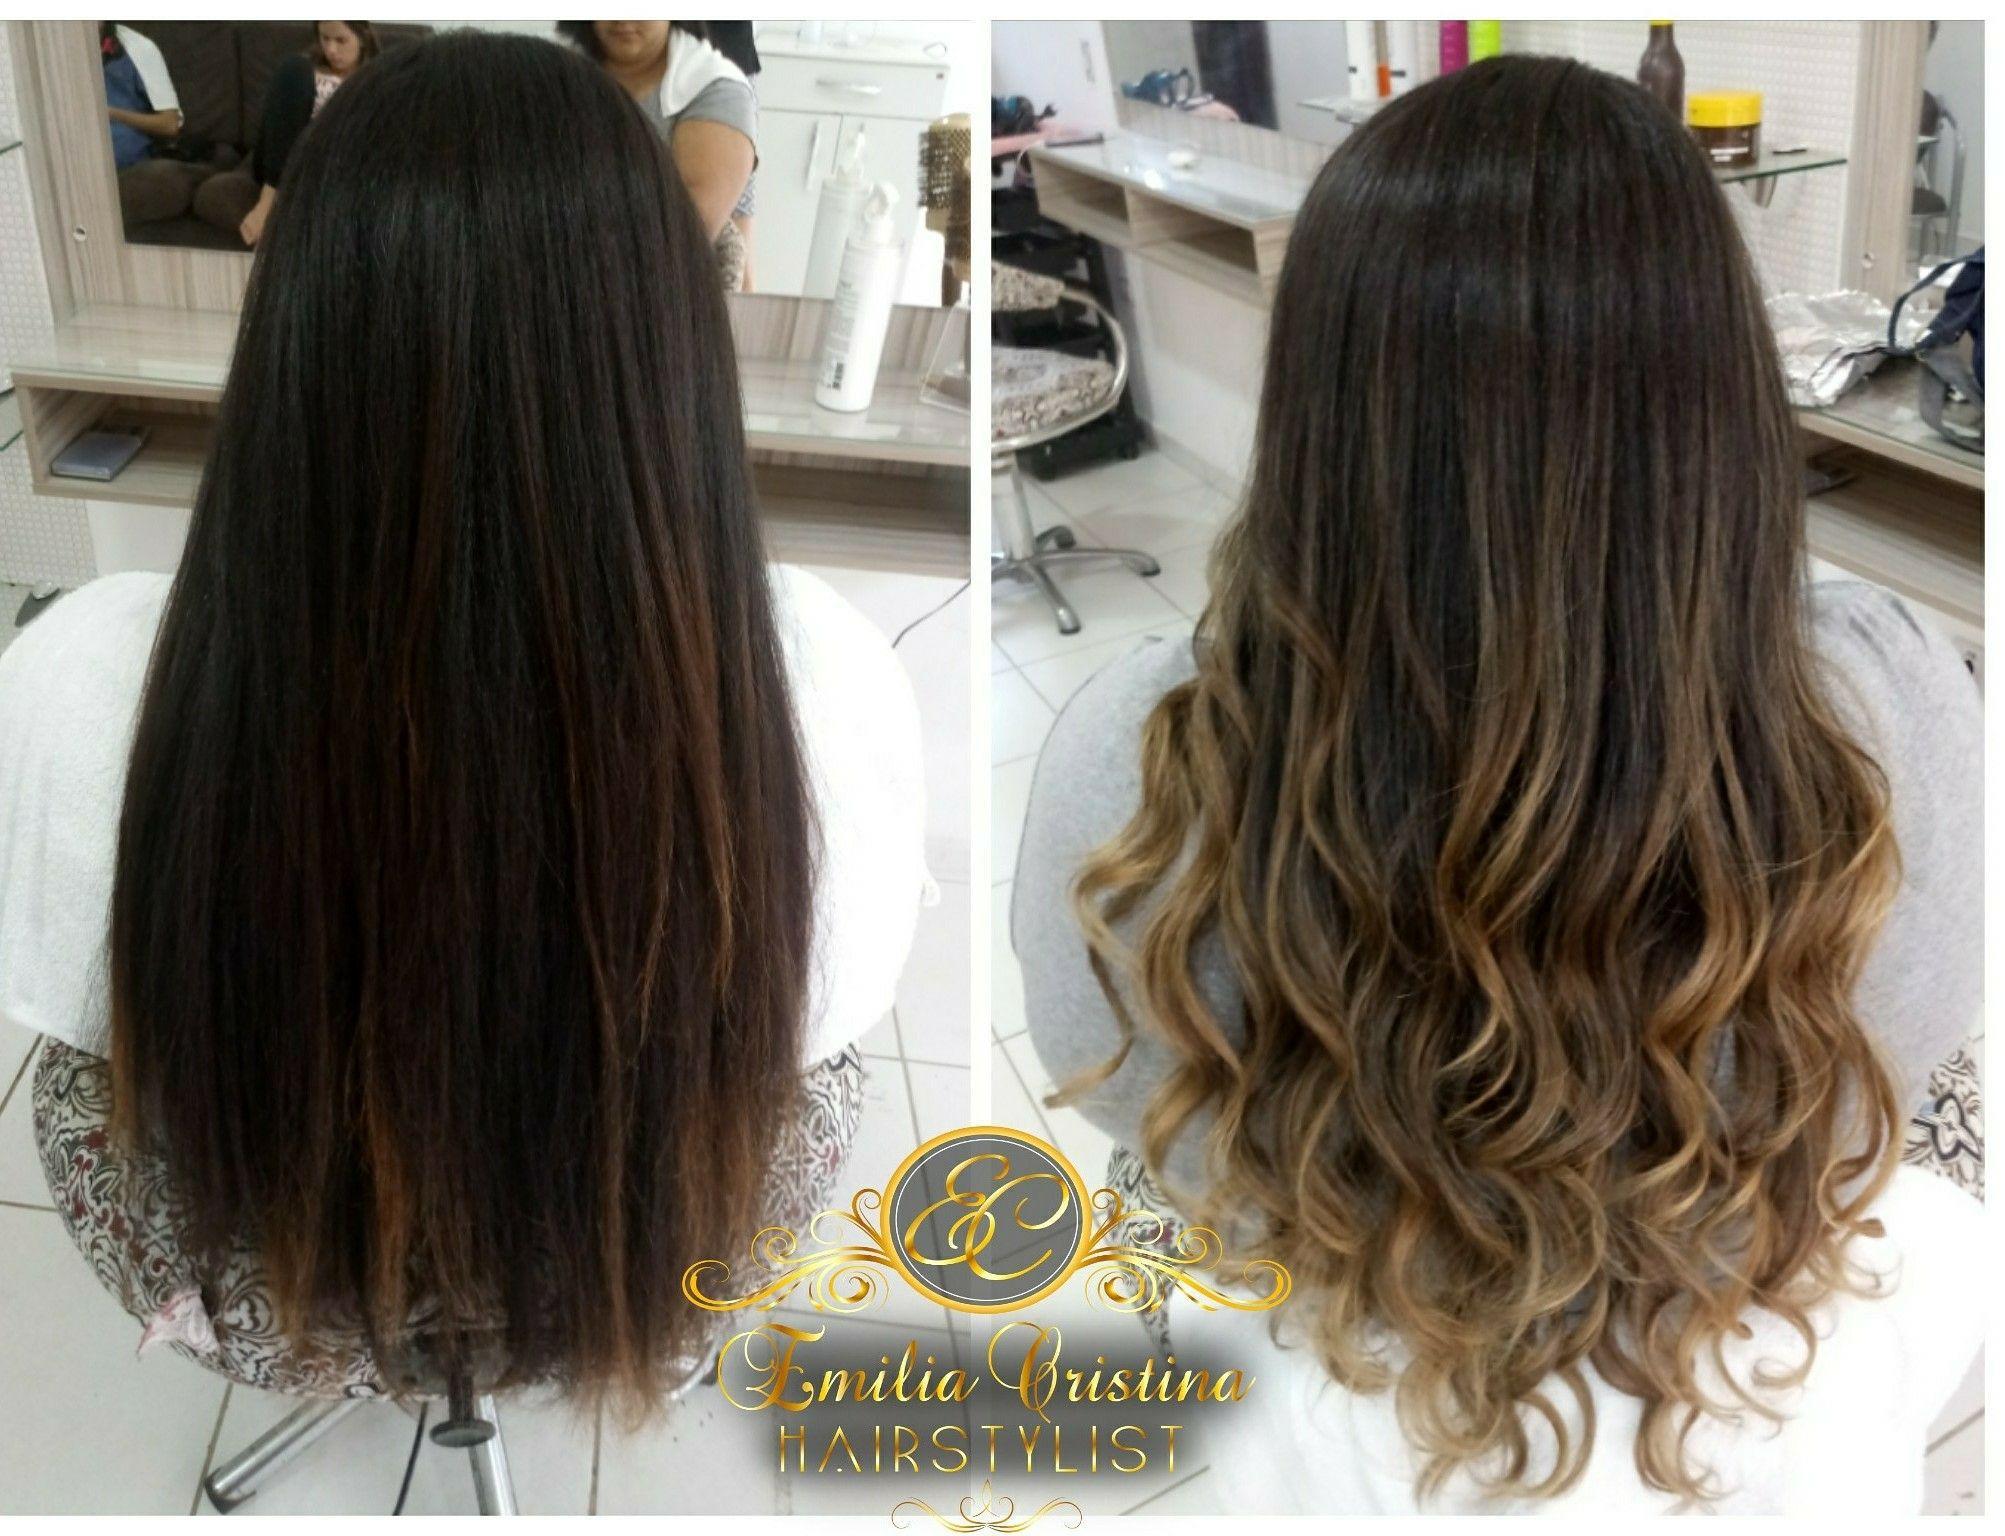 Morena iluminada#loiromarrondourado#morenailuminada cabelo cabeleireiro(a) stylist / visagista